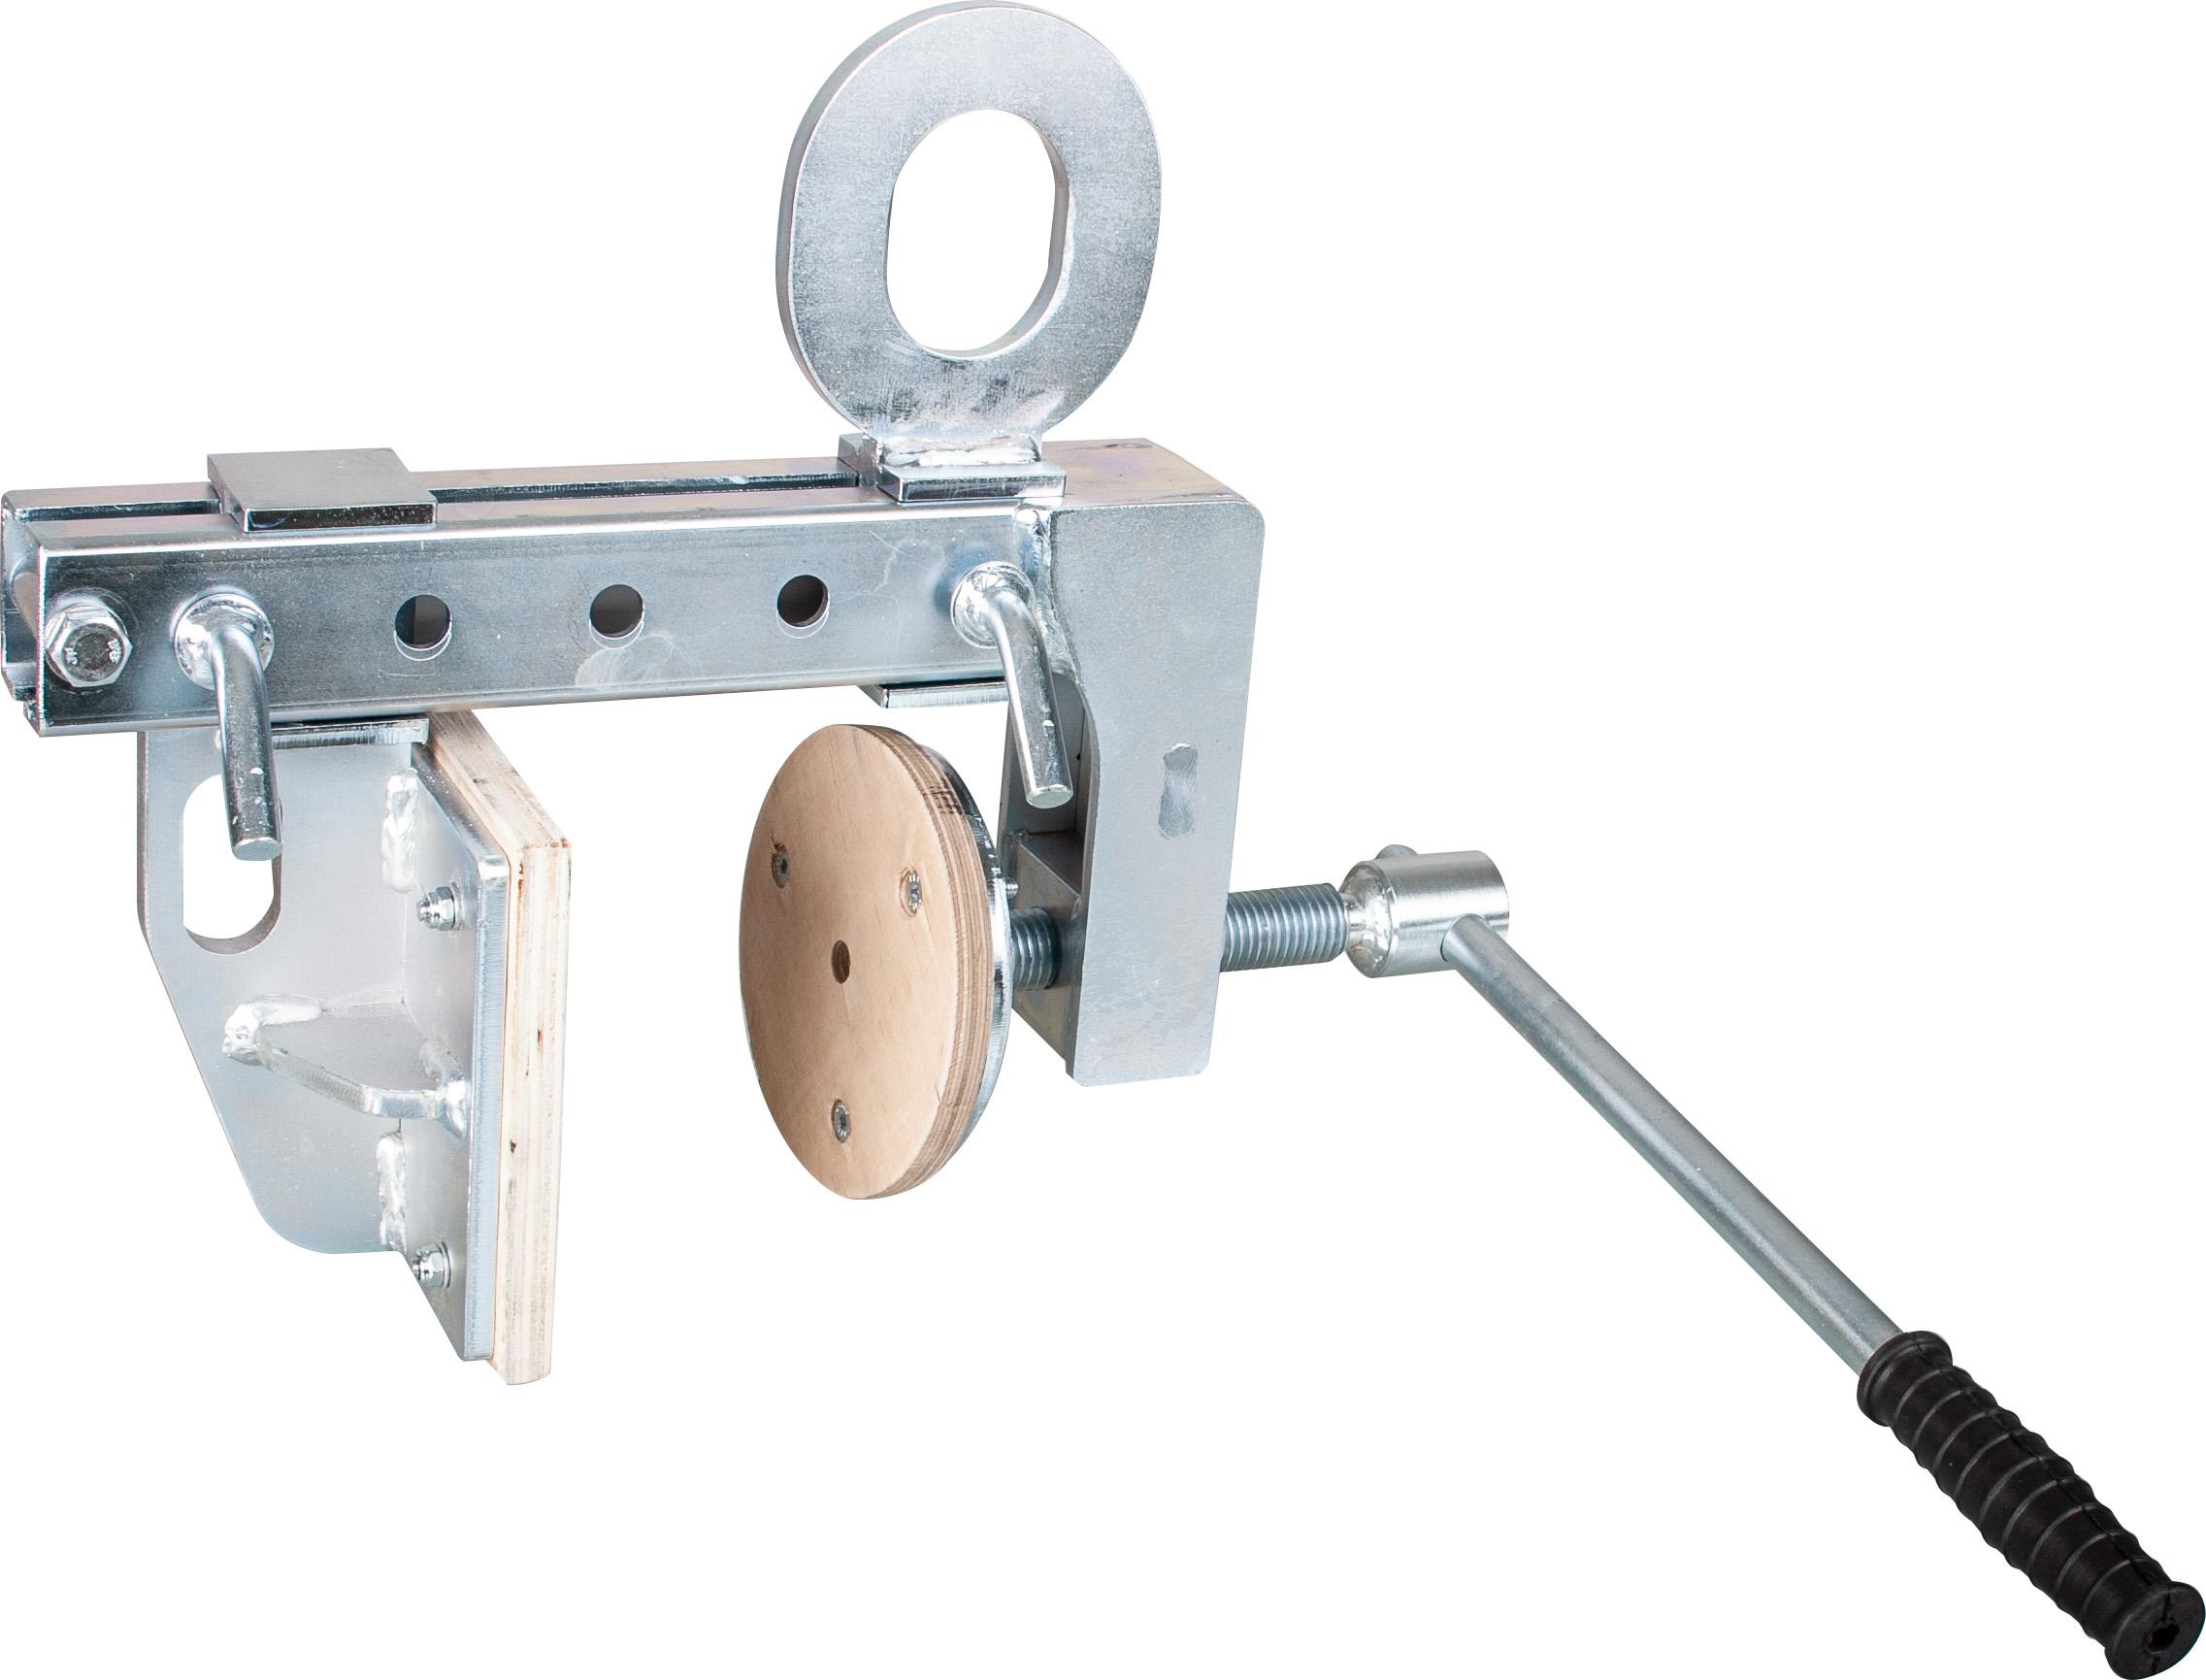 Grabmal-Plattengreifer GPM 400